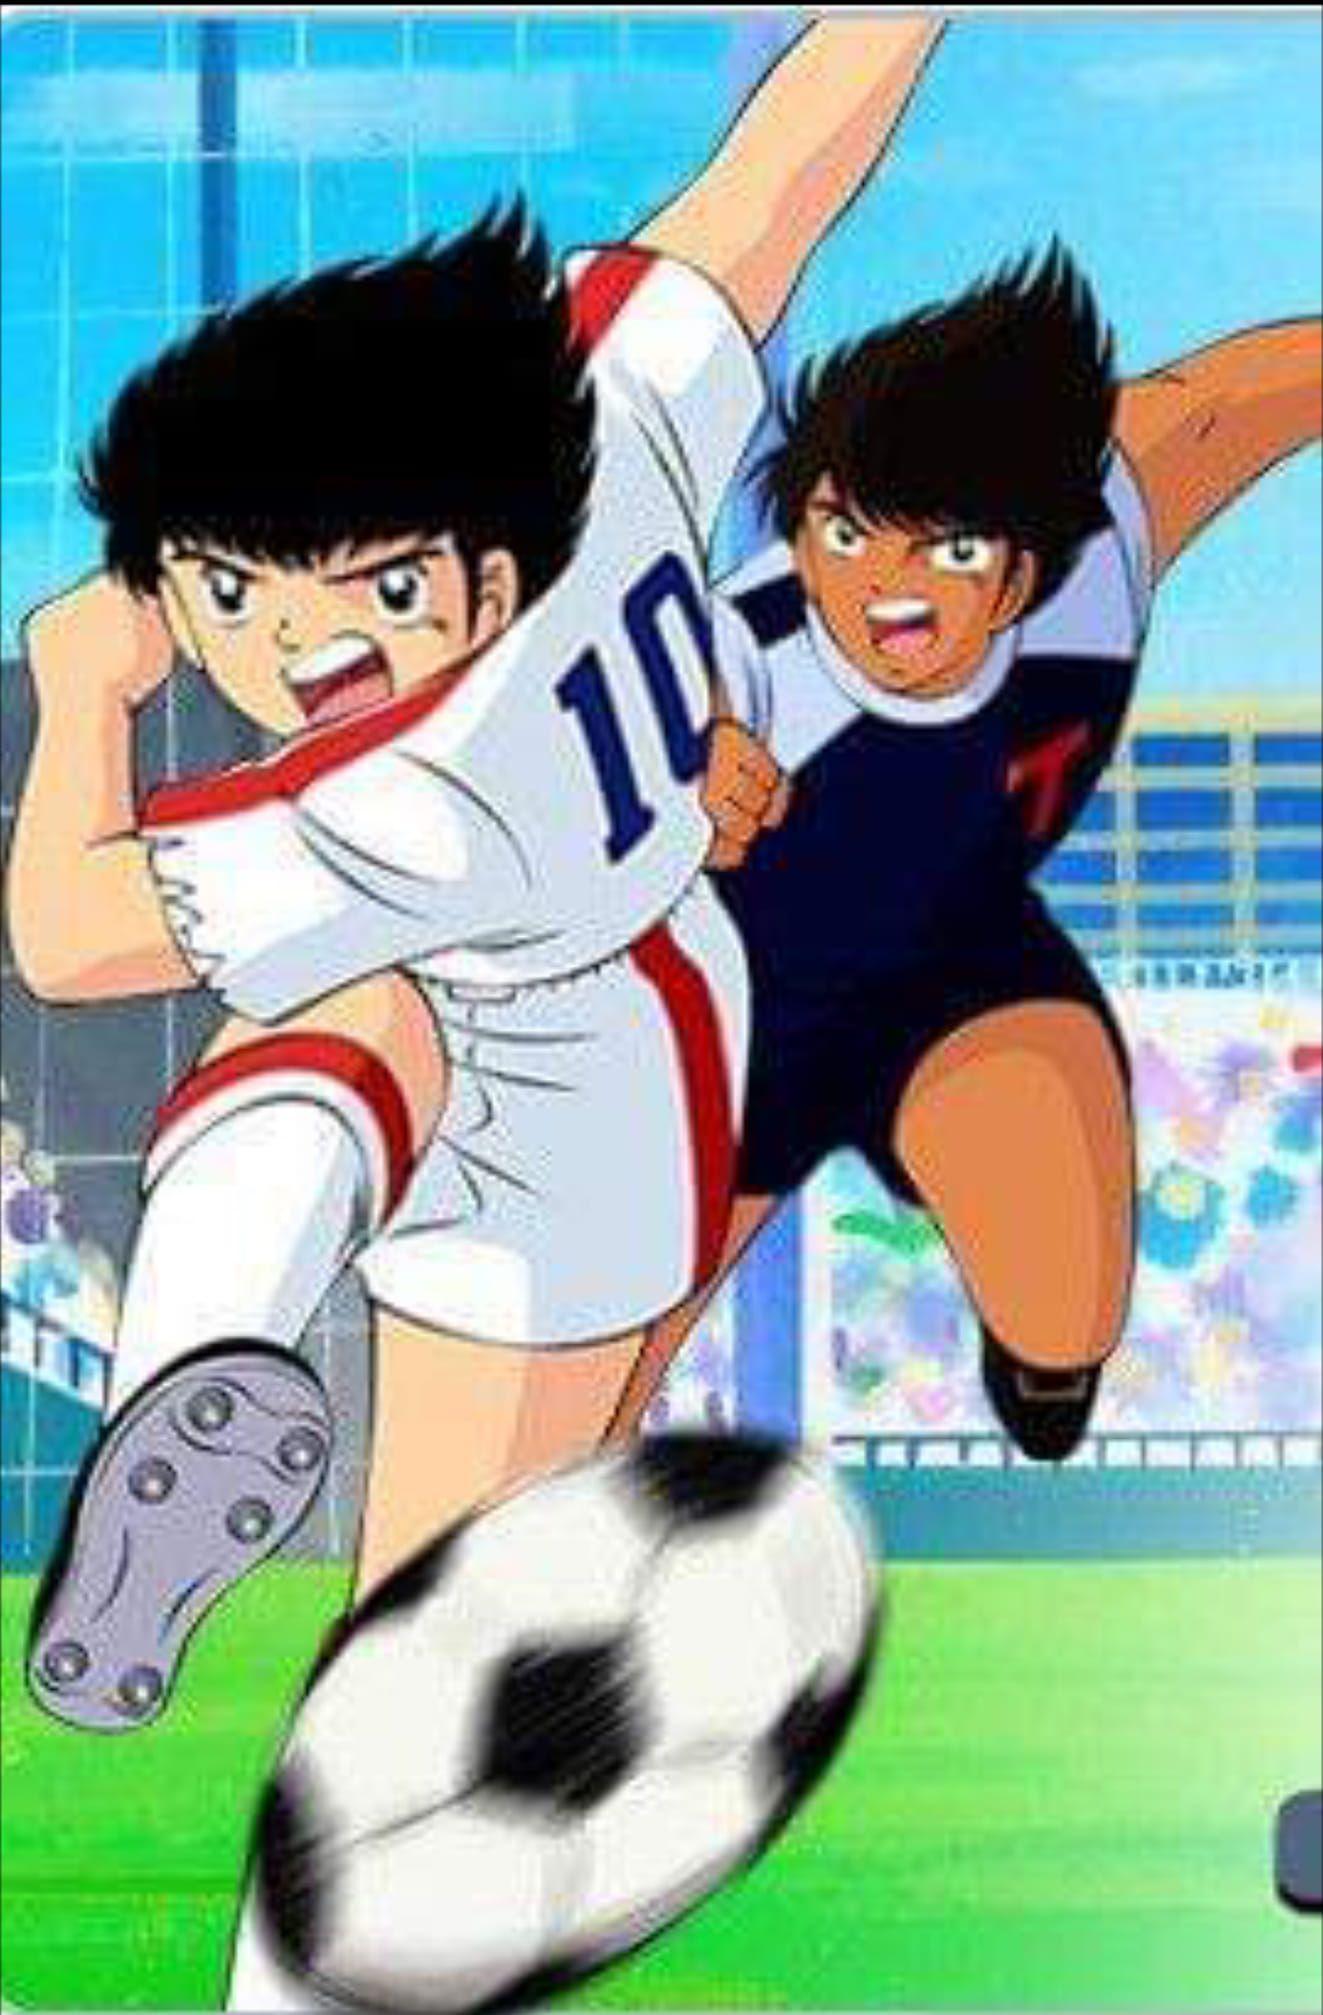 Captain tsubasa صور اطفال cartoni animati anime e fumetti marvel